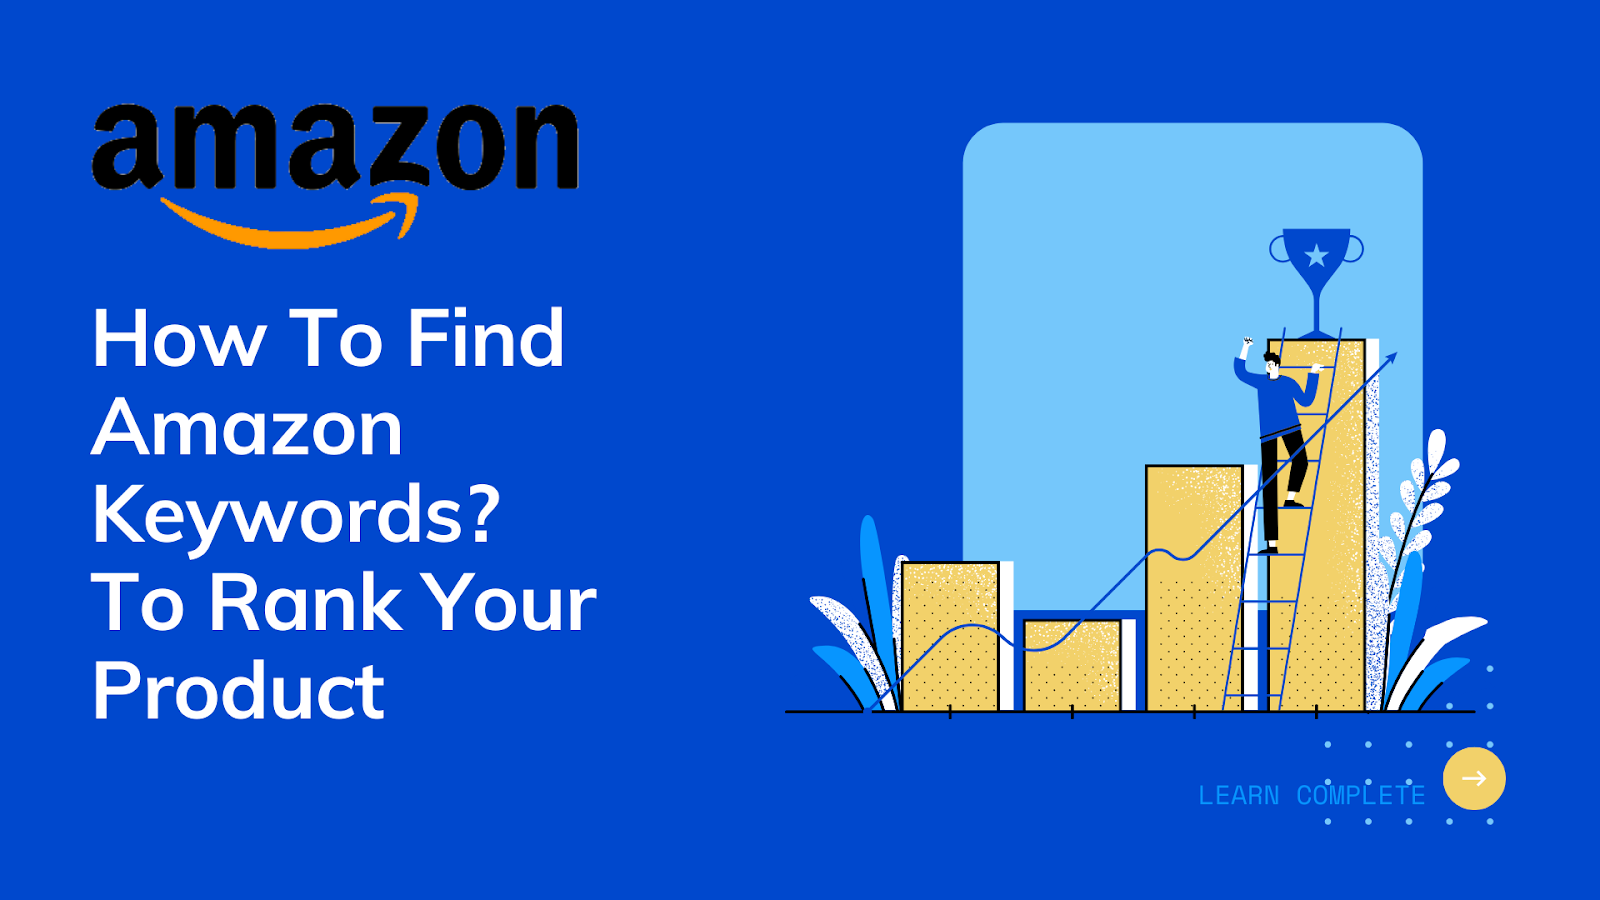 how to rank for keywords on amazon,amazon keywords,how to find keywords,amazon fba keywords,amazon keyword tool,keyword research,how to sell on amazon,how to find the best amazon keywords,amazon keyword research,amazon fba keyword tutorial,fba keywords tutorial,how to find keywords for amazon fba,keyword ranking amazon,how to find keywords for merch by amazon,how to do keyword research